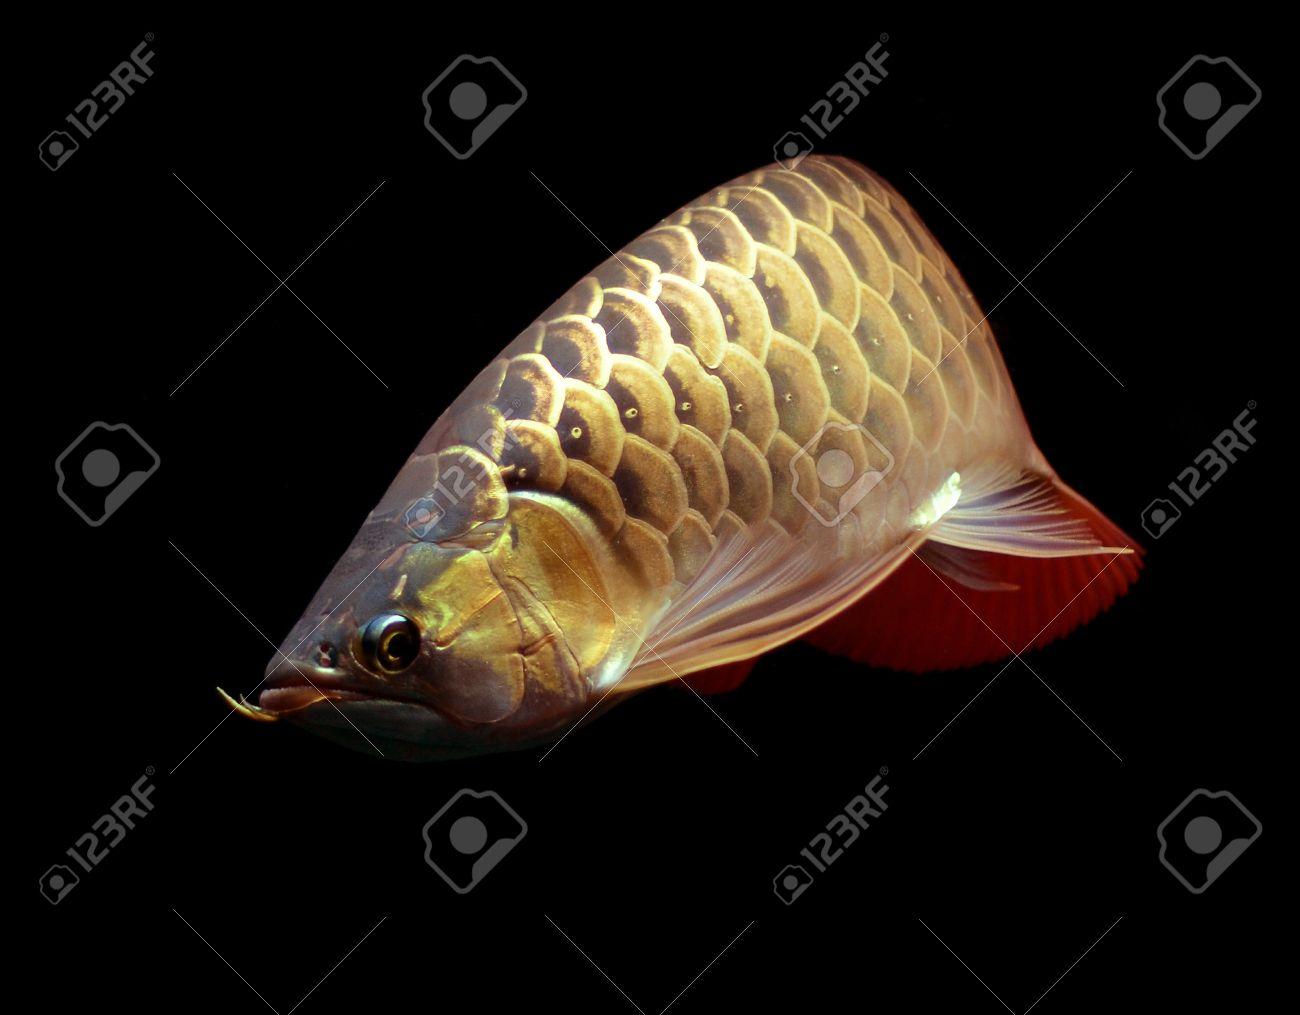 Asian Red Arowana fish on black background Stock Photo - 18094277